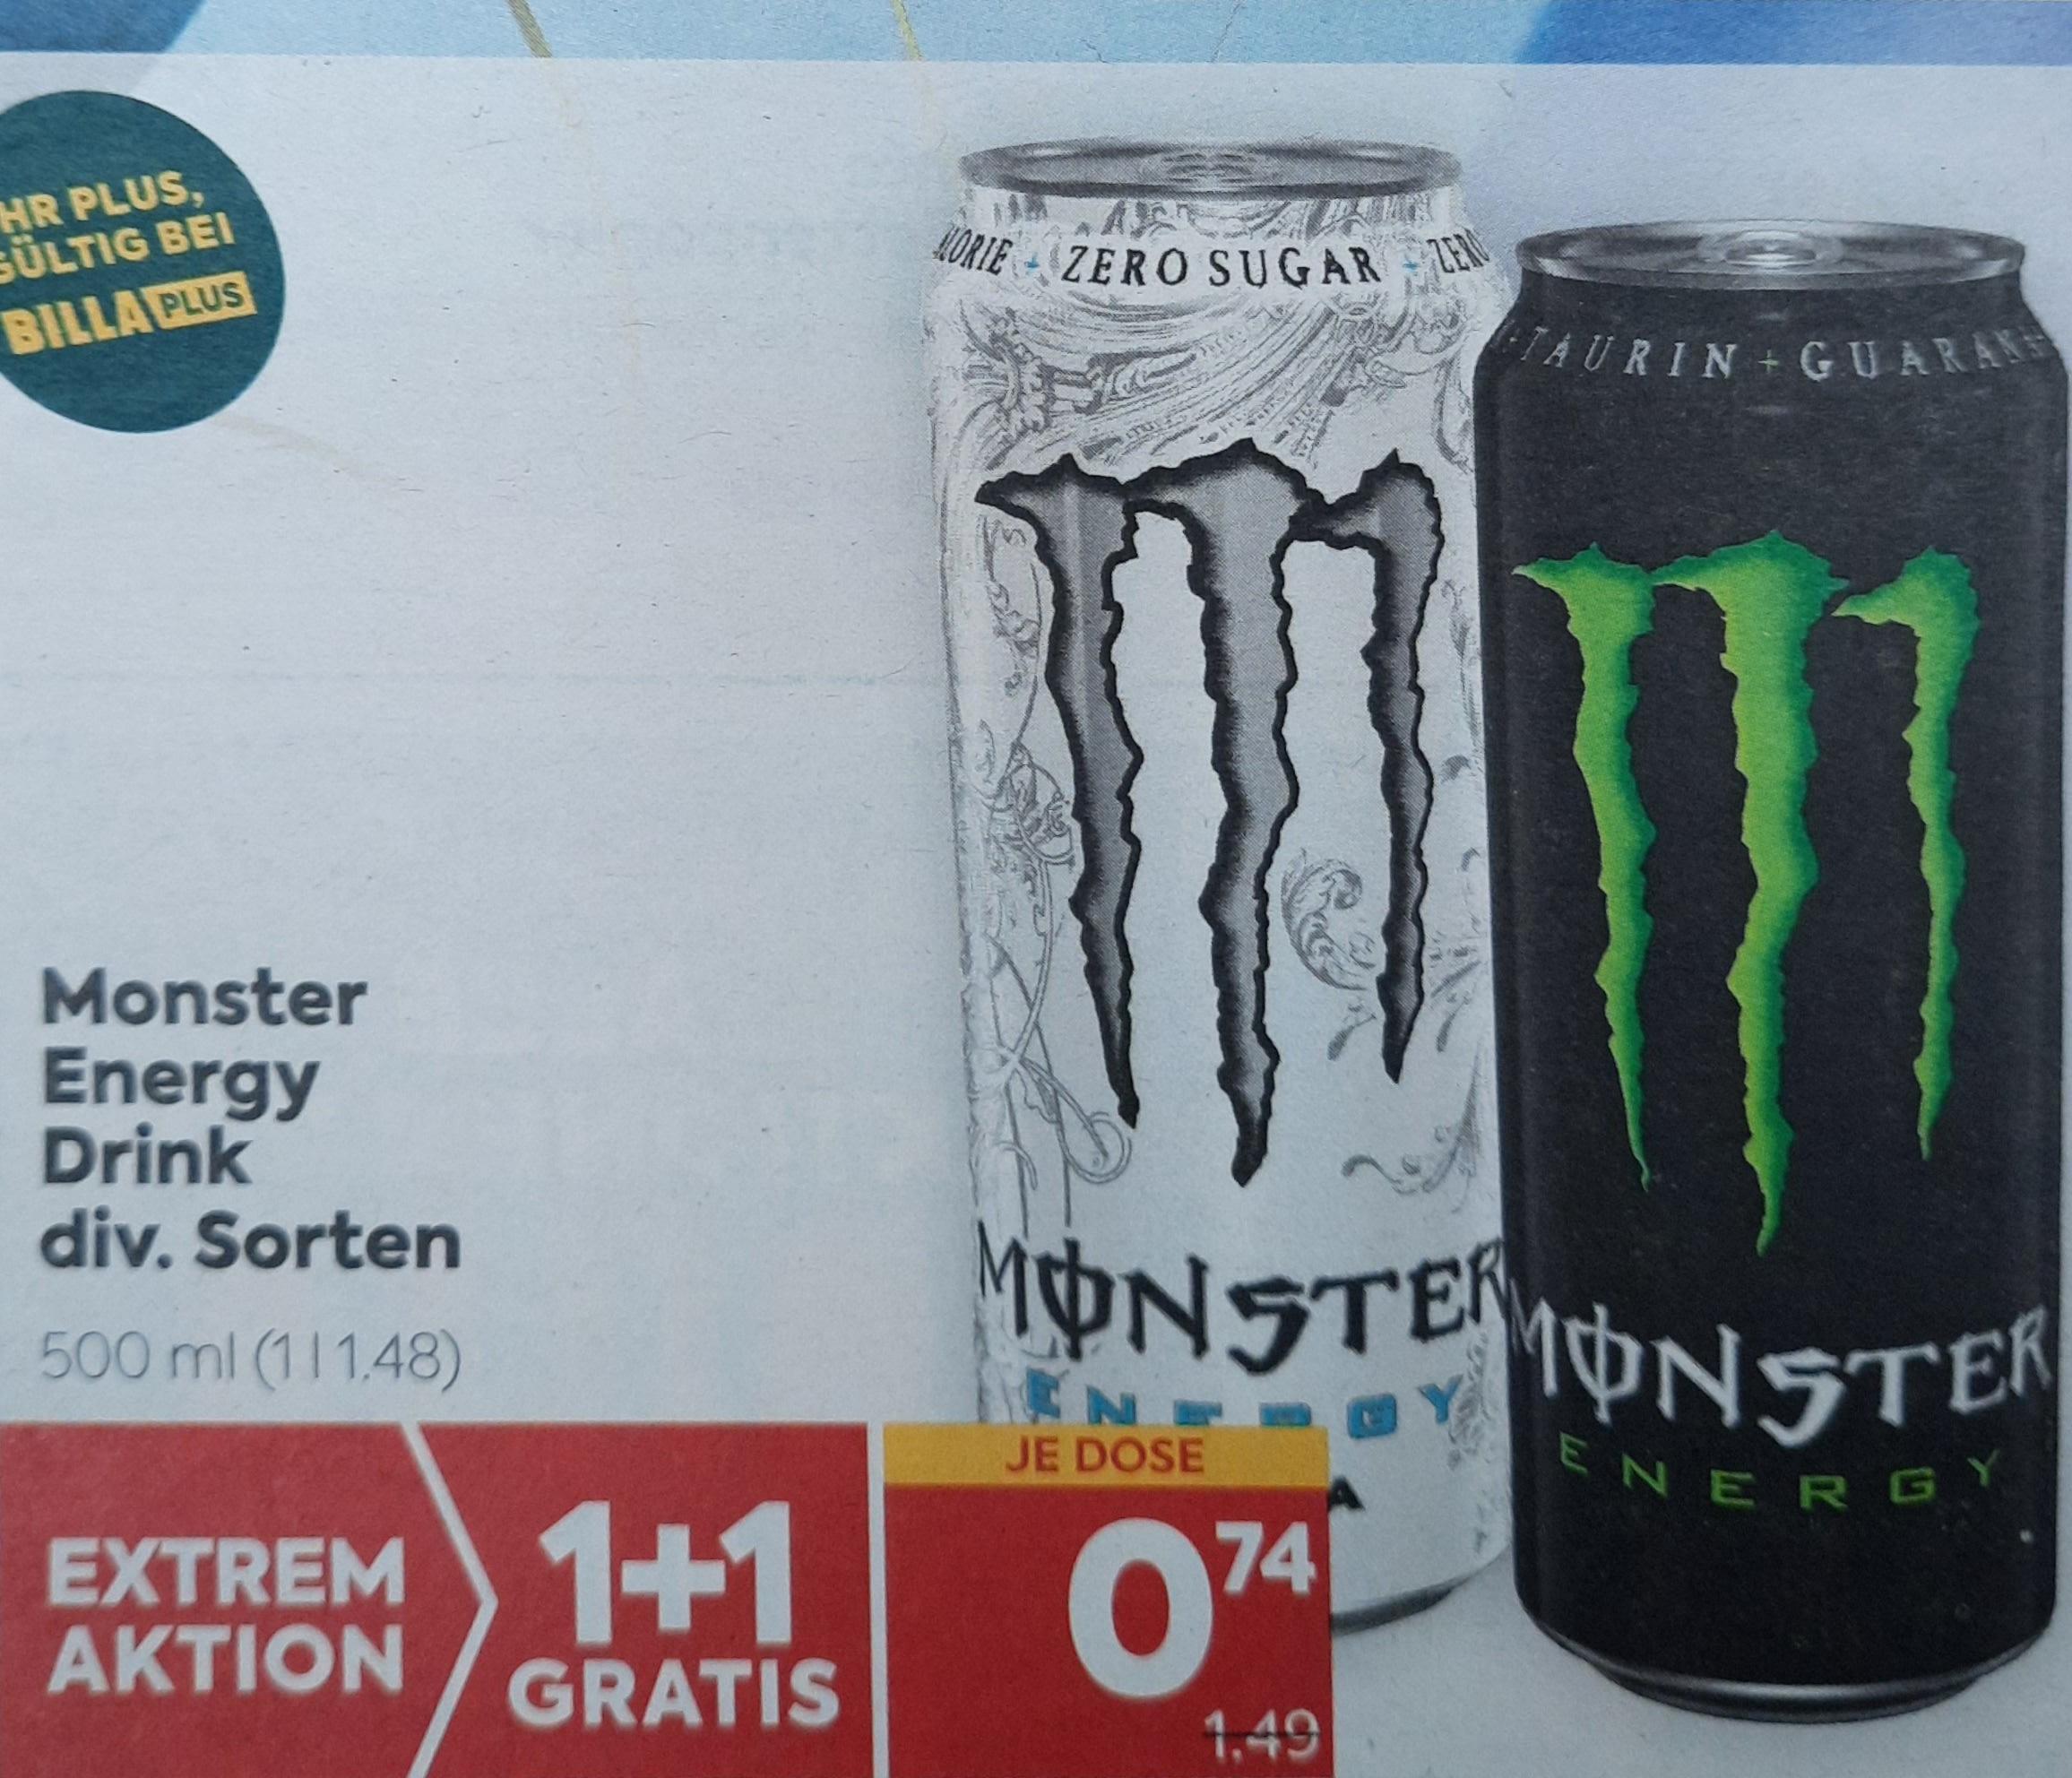 [Billa Plus] Monster Energy 1 + 1 gratis